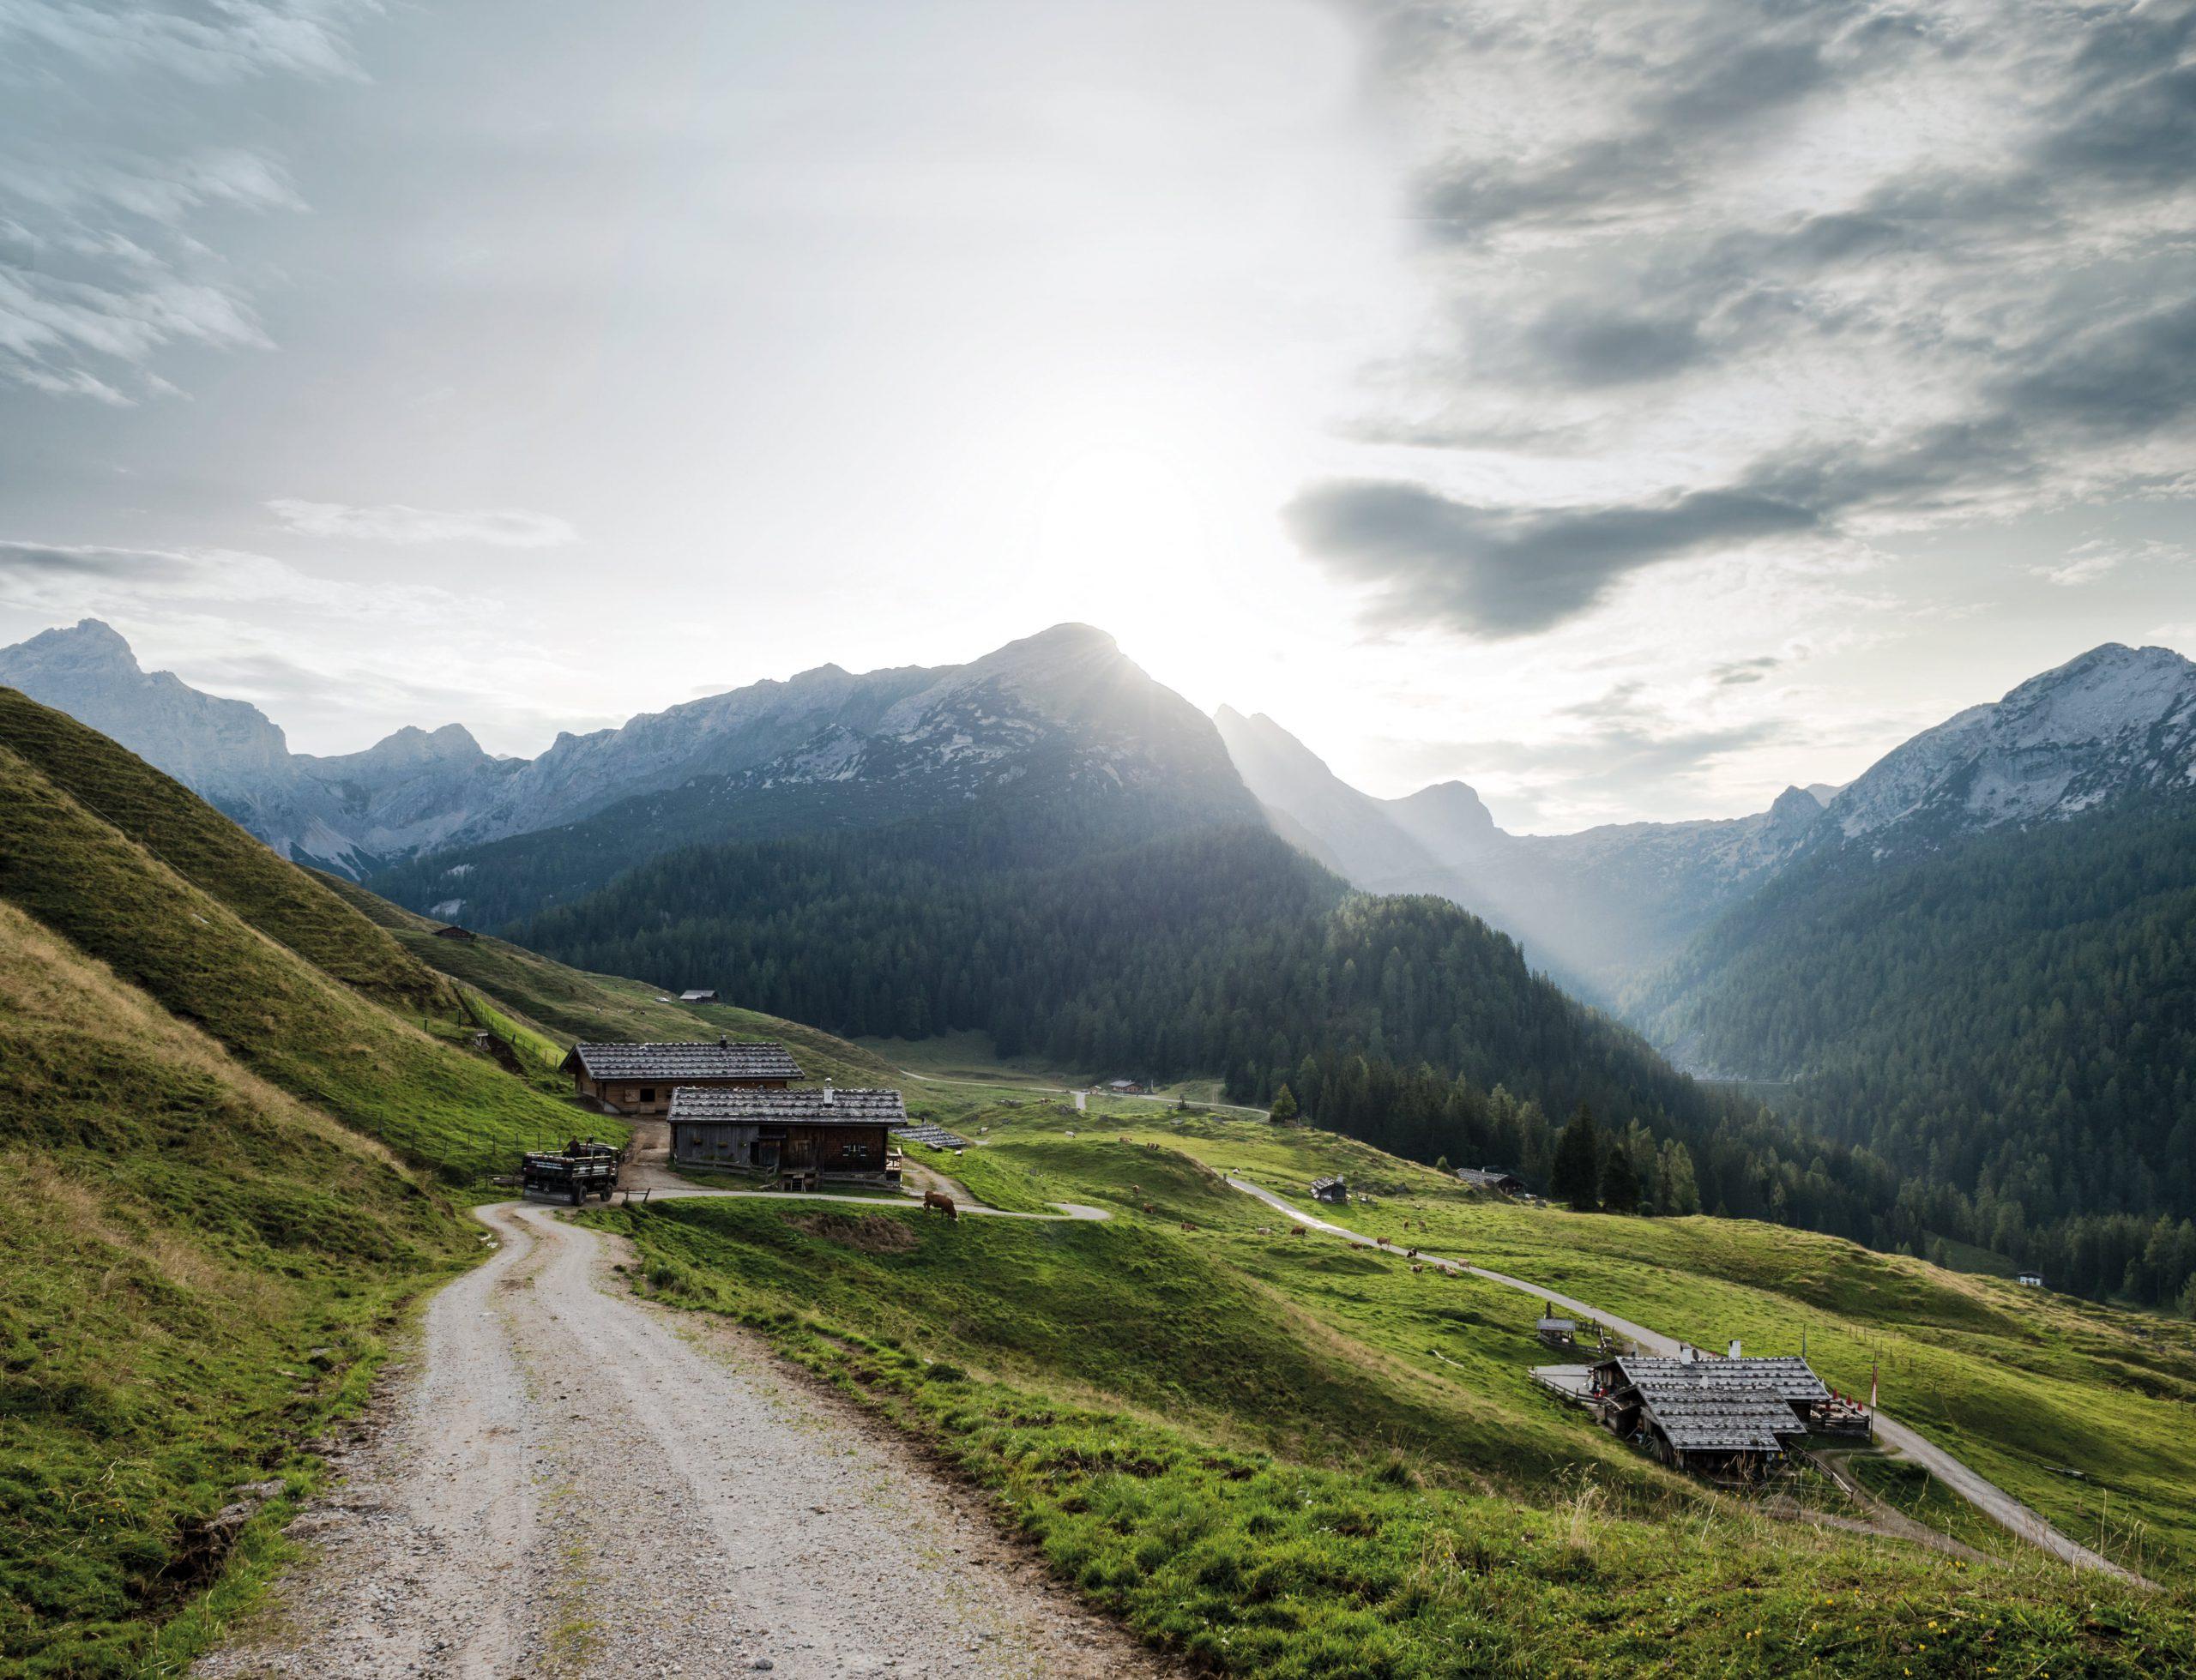 Molkerei Berchtesgadener Land Impression